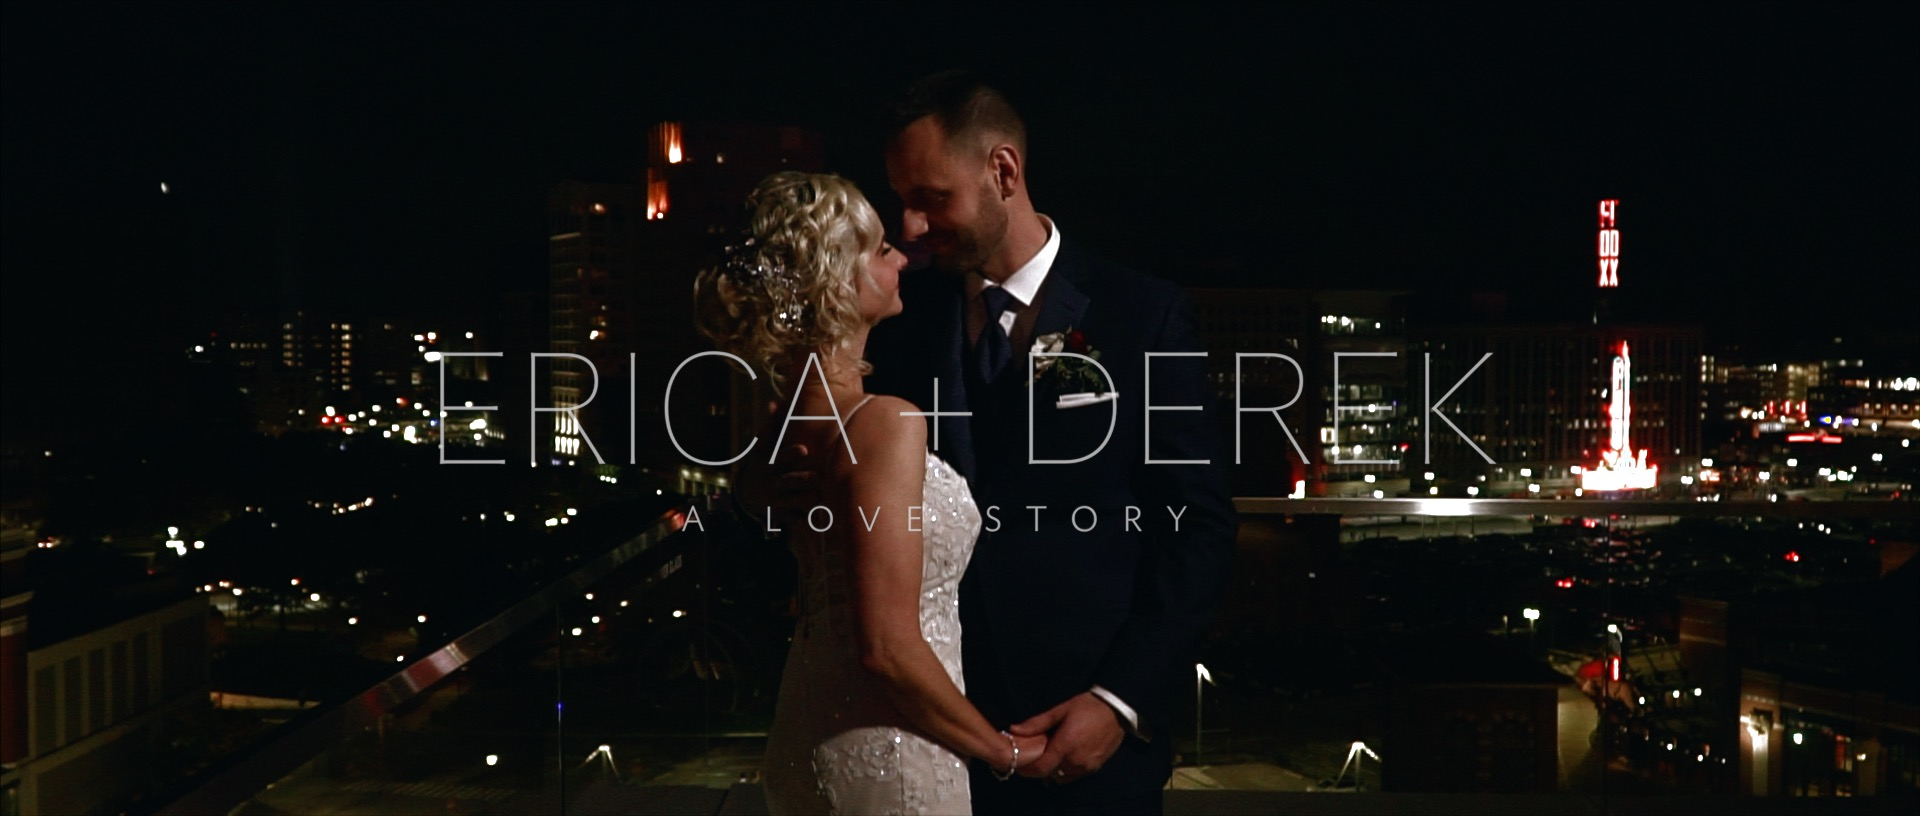 Erica + Derek | Detroit, Michigan | Detroit Athletic Club